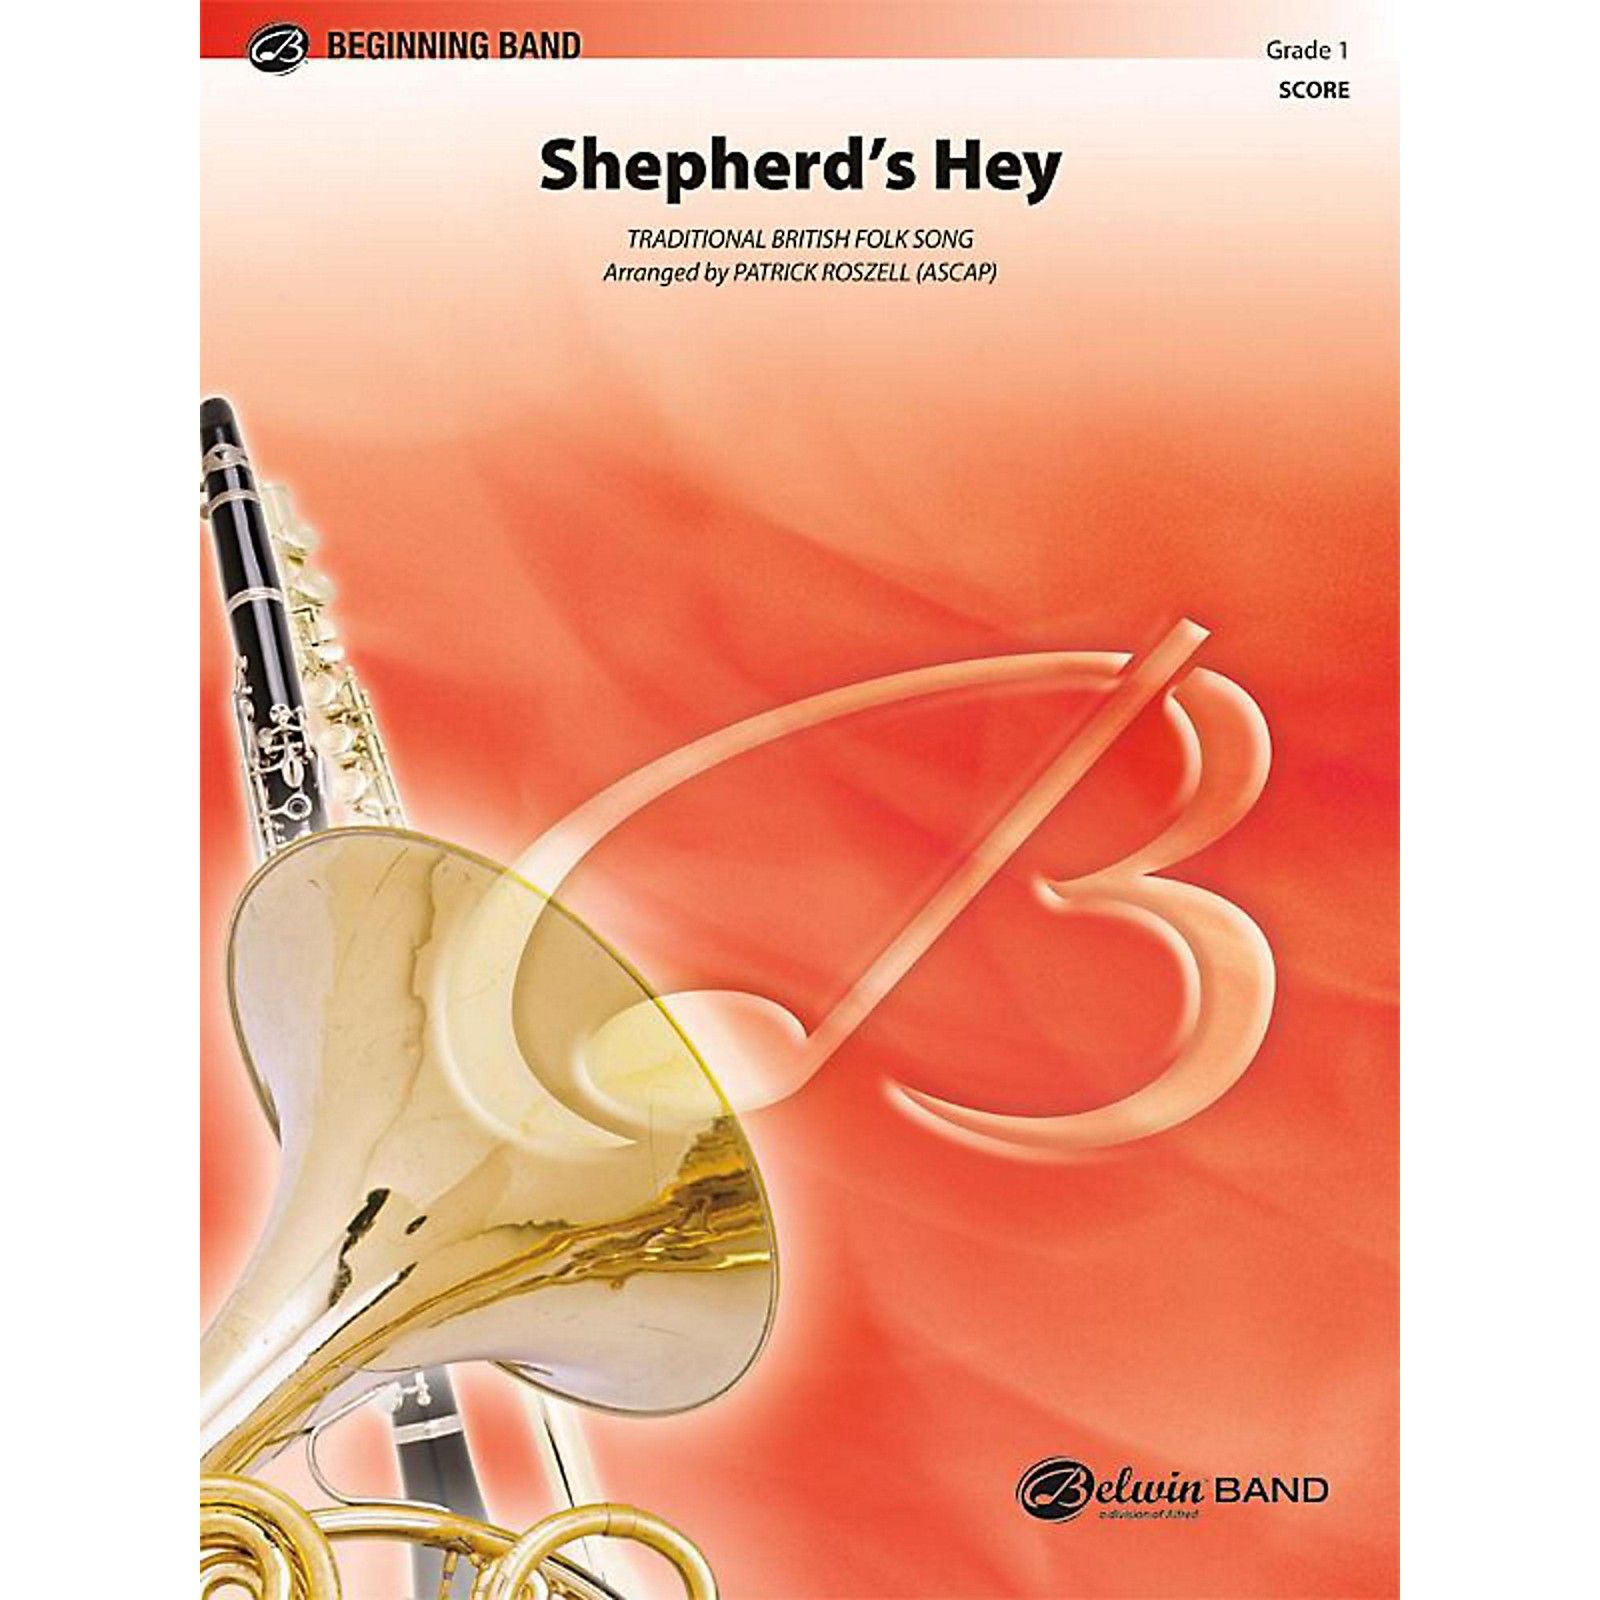 BELWIN Shepherd's Hey Grade 1 (Very Easy)